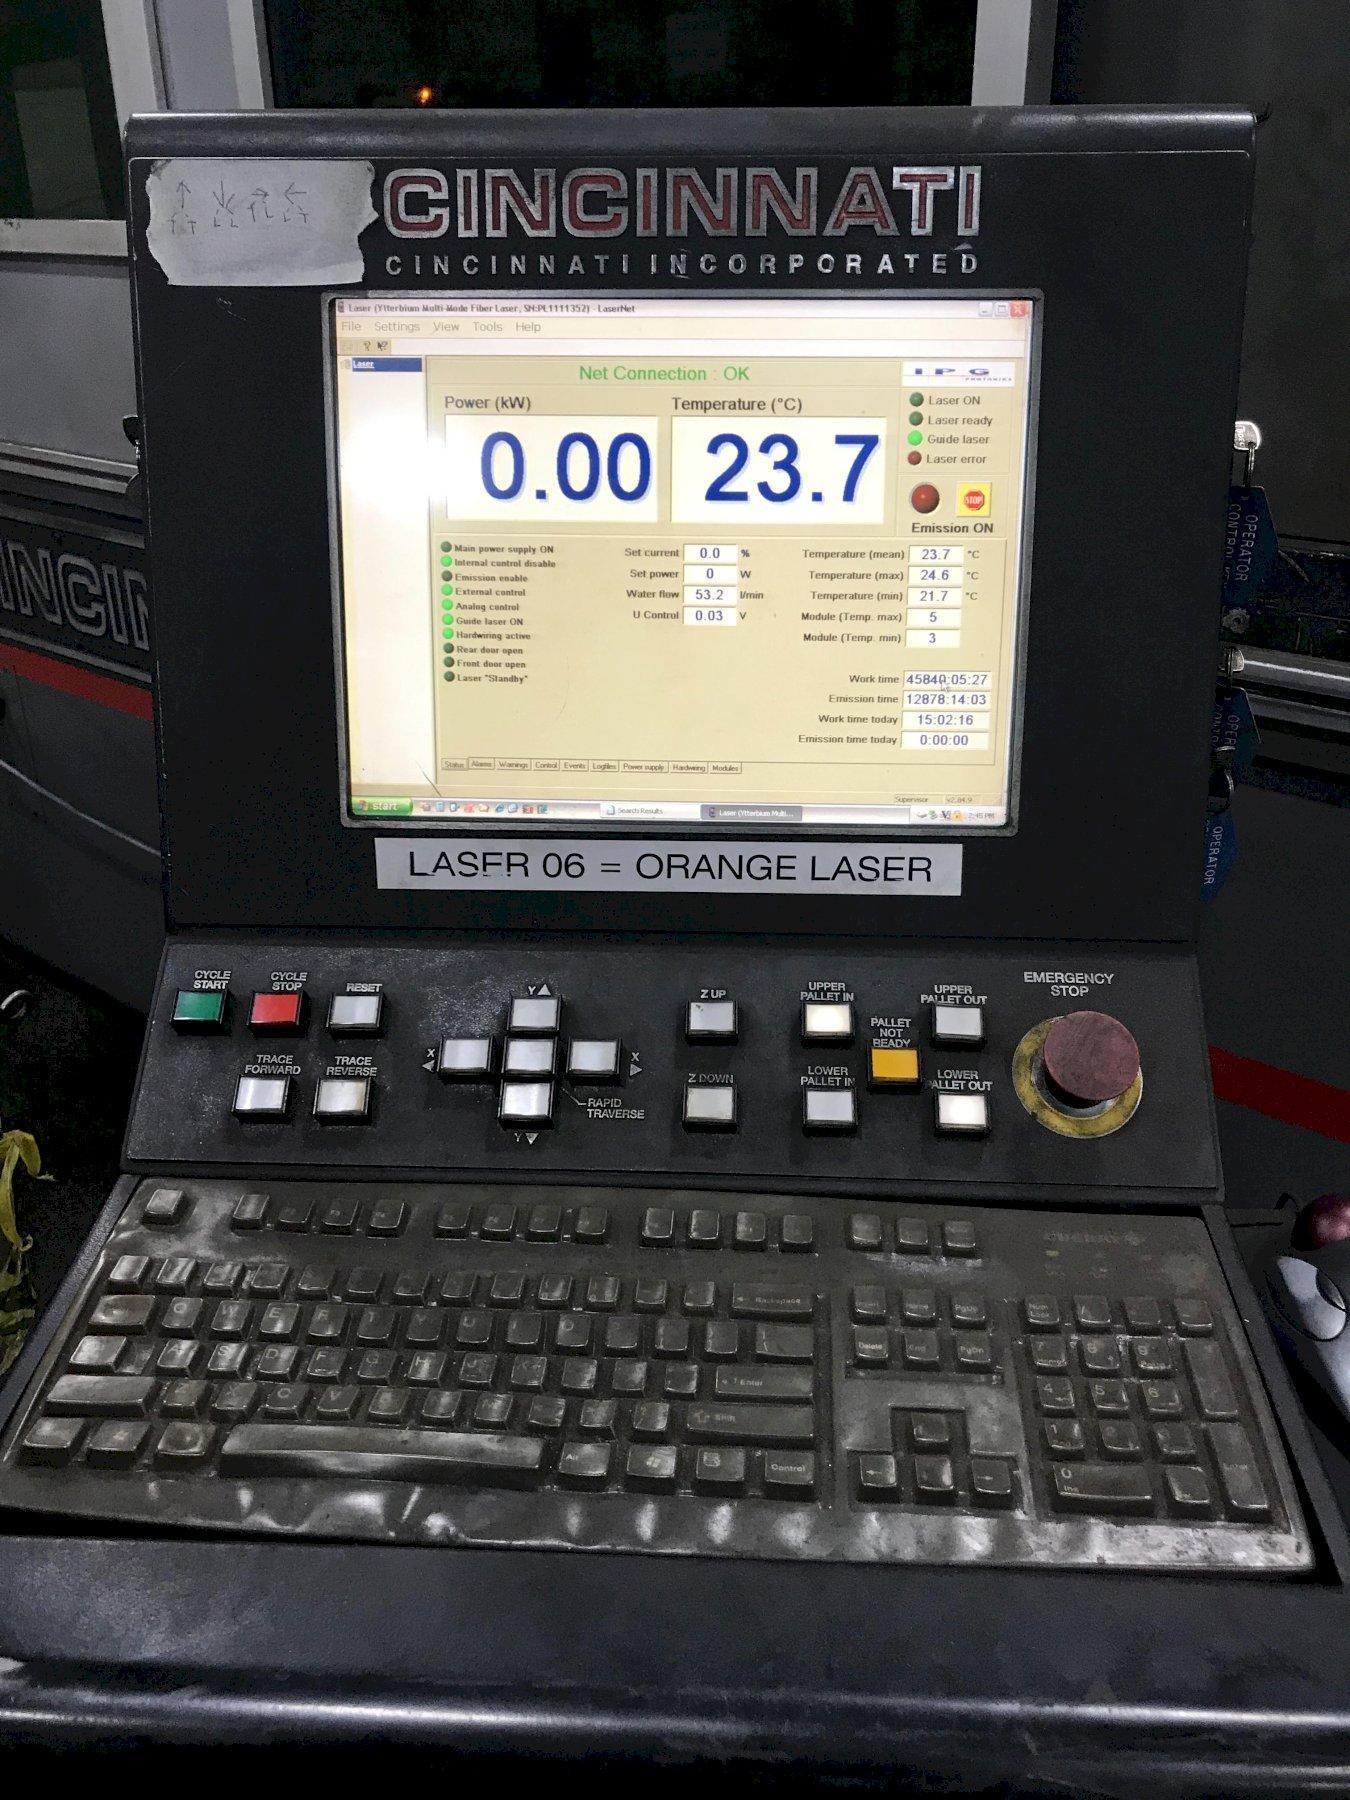 USED CINCINNATI 5' X 10' CNC FIBER LASER CUTTING SYSTEM MODEL CL940, Year: 2012, Stock # 10720